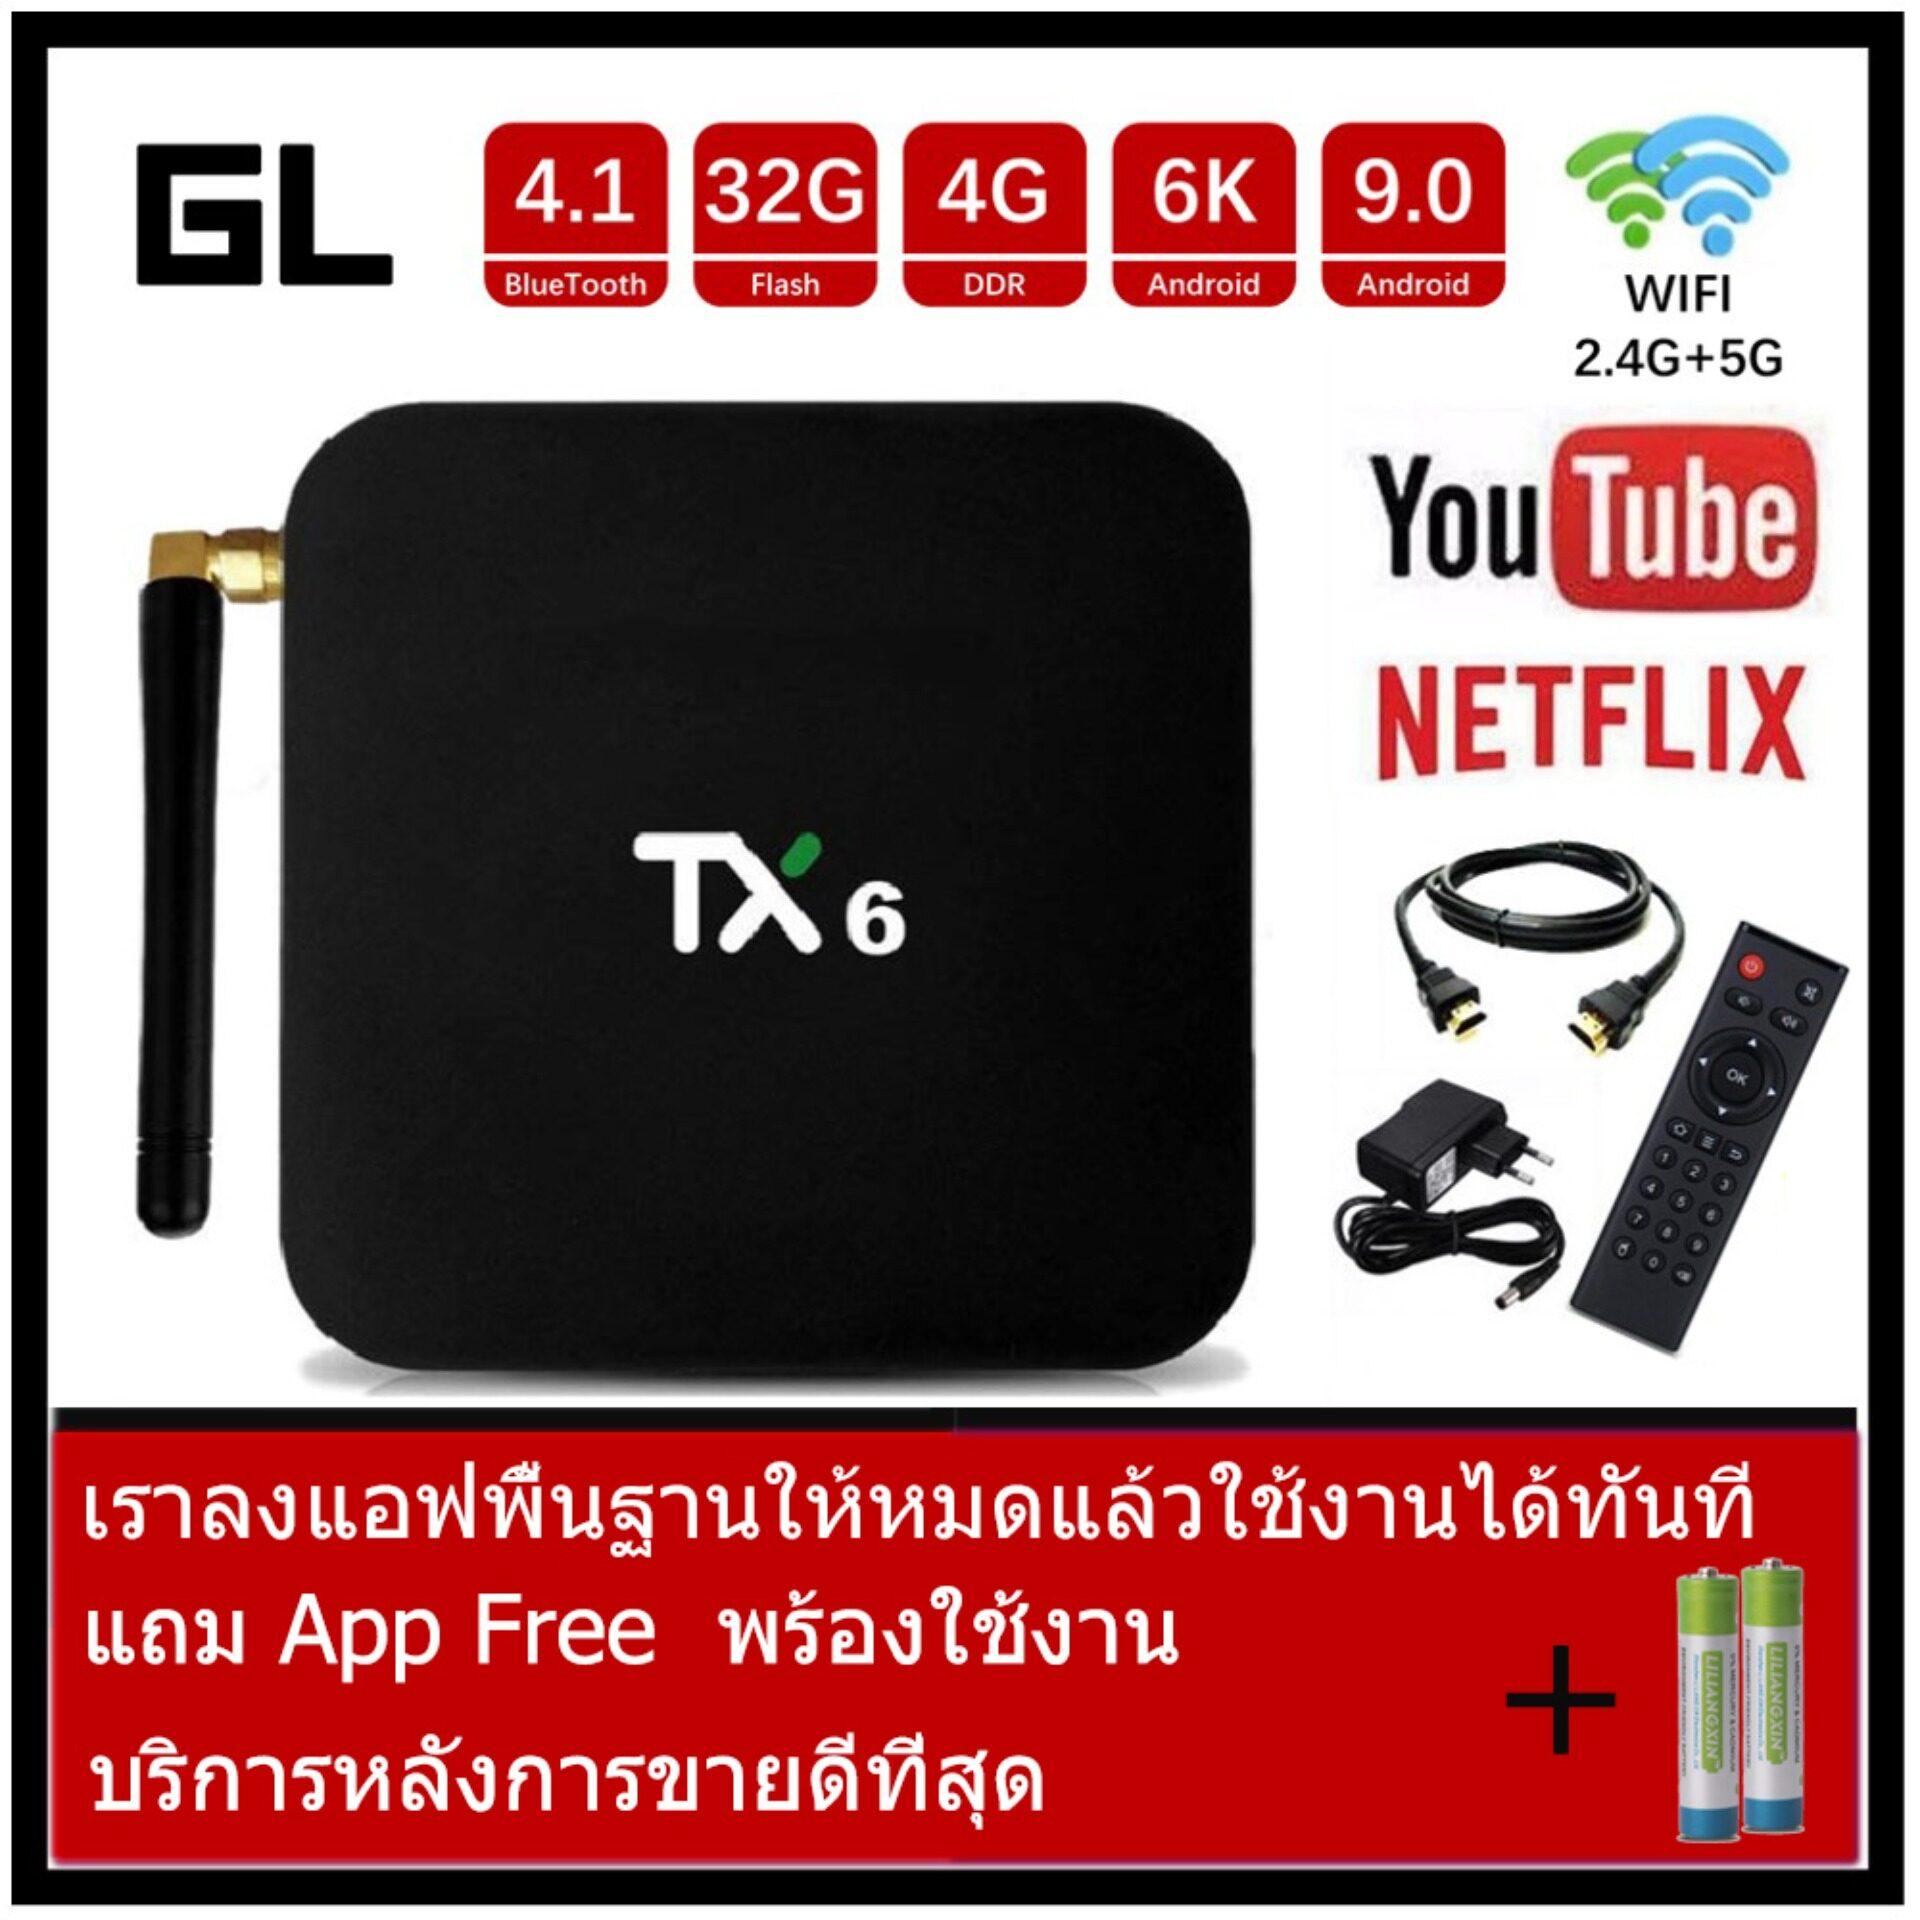 TX6 Allwinner H6 Ram 4GB / 32GB Android 9.0 4K กล่องทีวีกับจอแสดงผล LED Dual Band WiFi LAN USB3.0